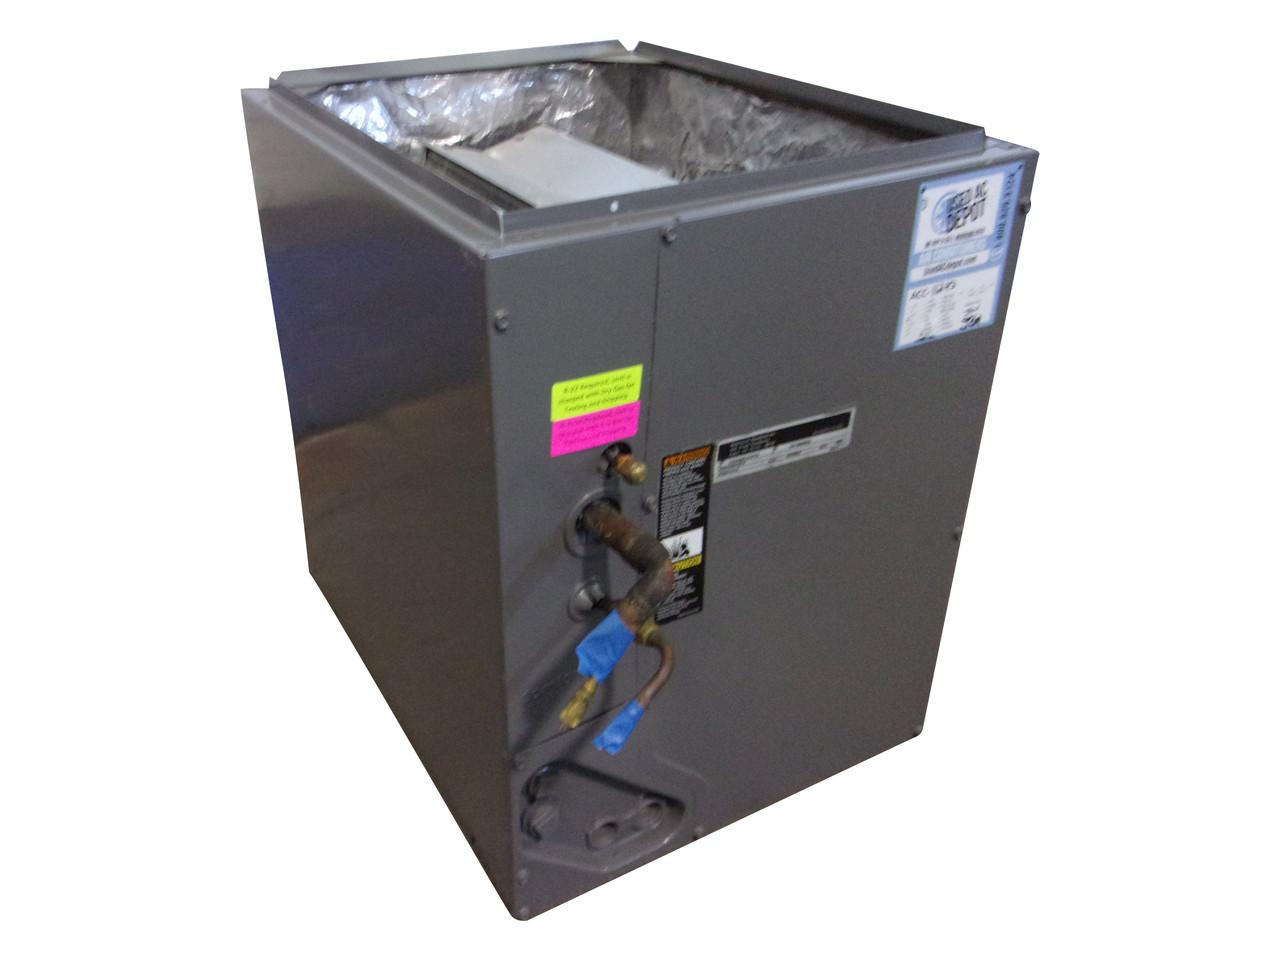 TRANE Used Central Air Conditioner Cased Coil TXC036C4HPC0 ACC-11243